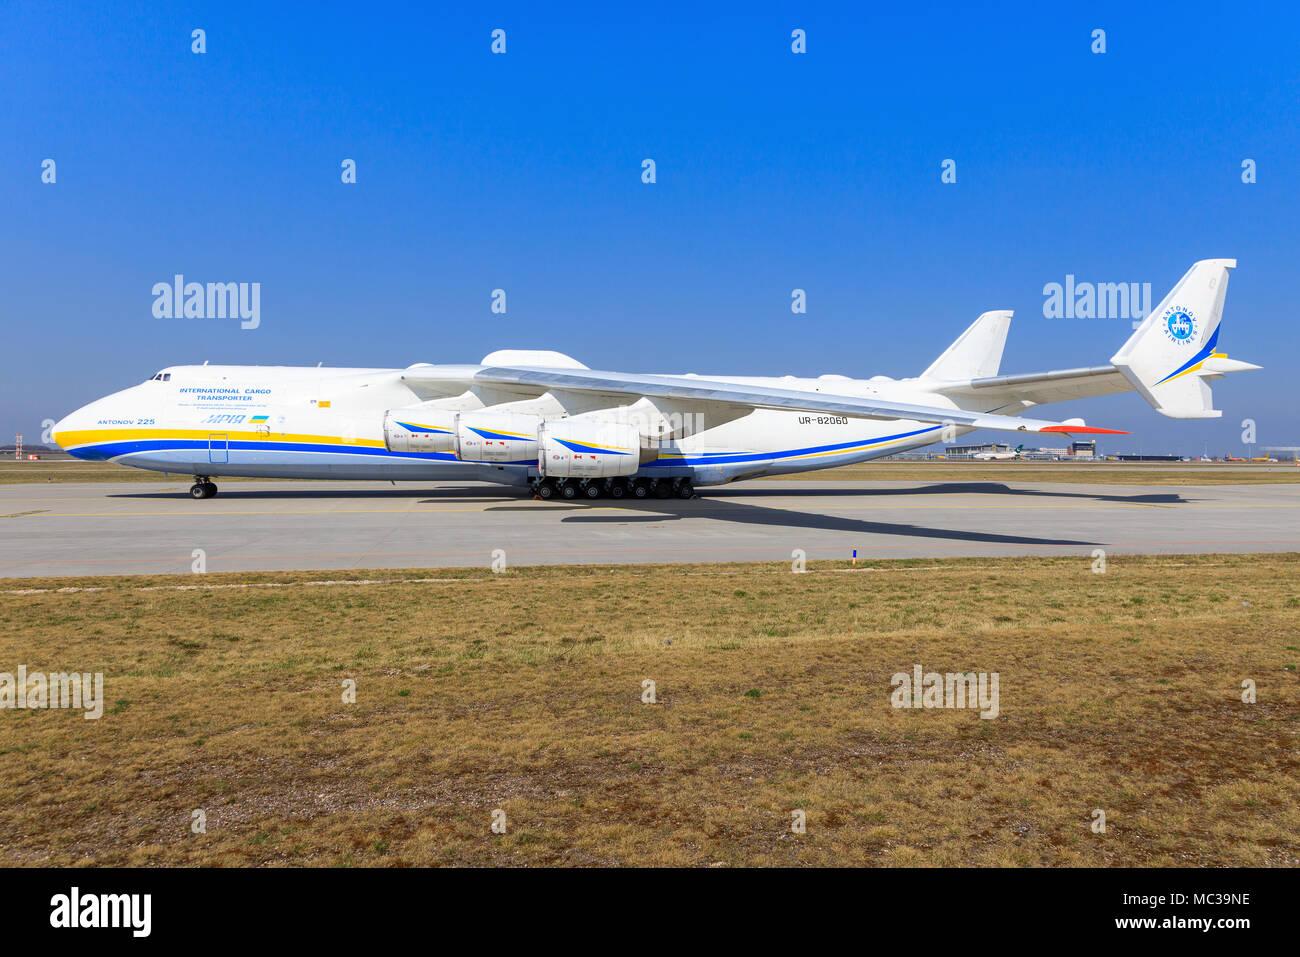 Leipzig/Germany: Antonov 225 from Design Bureaus at Leipzig/Germany 28.03.2017 - Stock Image